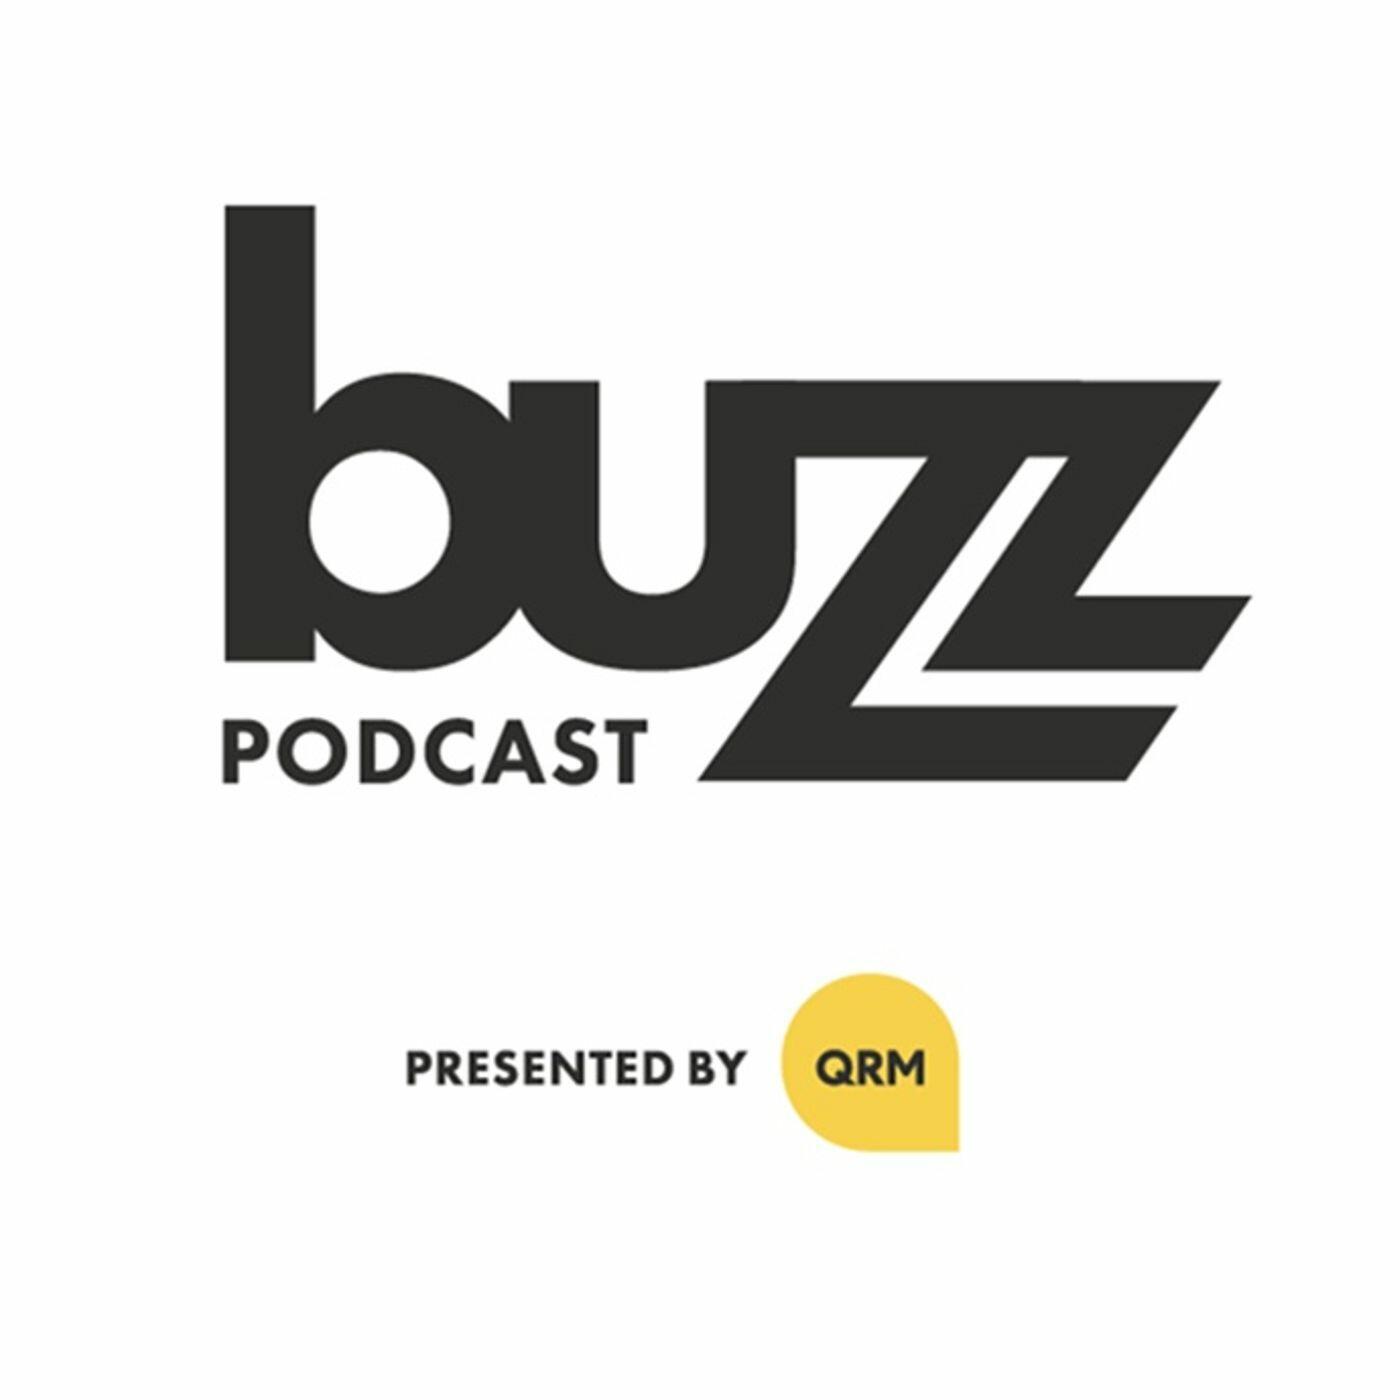 QRM Buzz Podcast